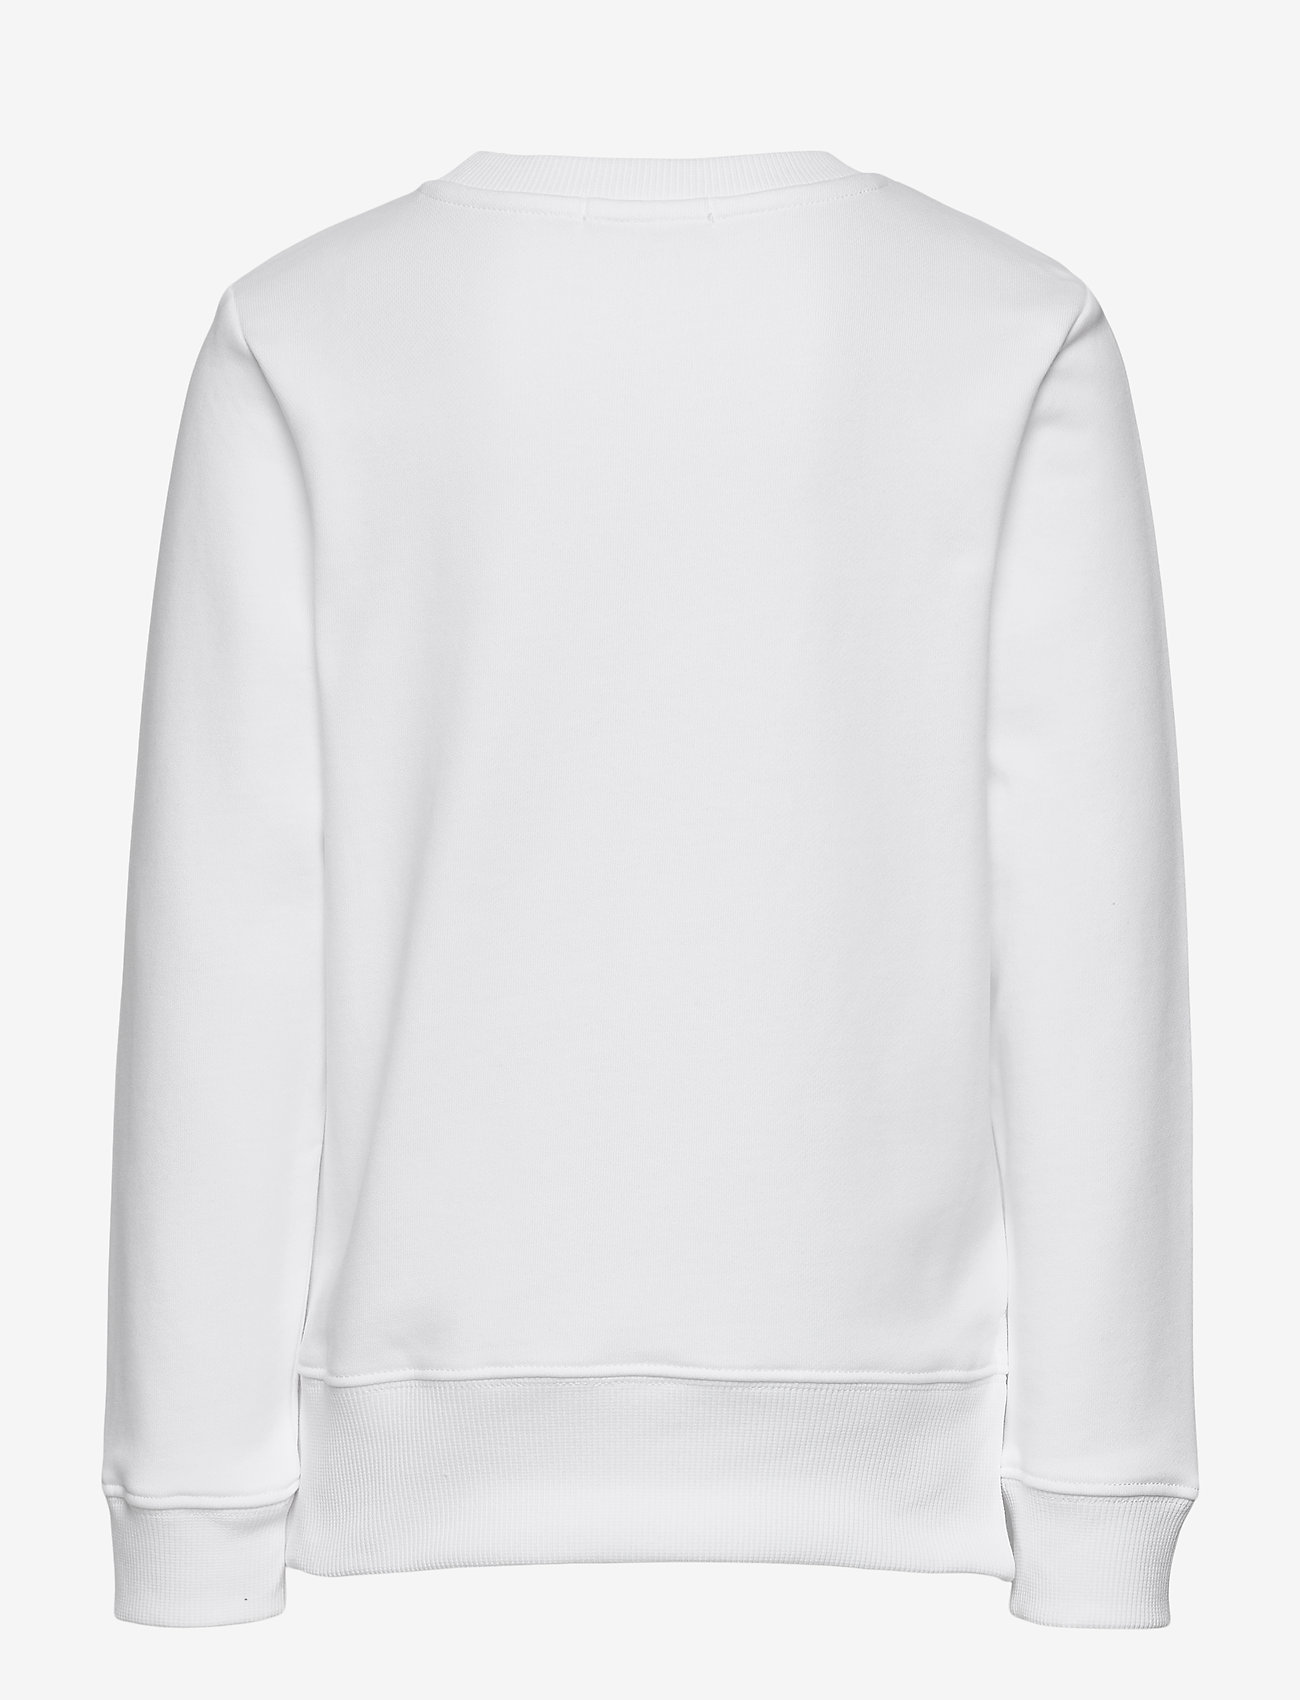 Calvin Klein - RAISED MONOGRAM SWEATSHIRT - sweatshirts - bright white - 1